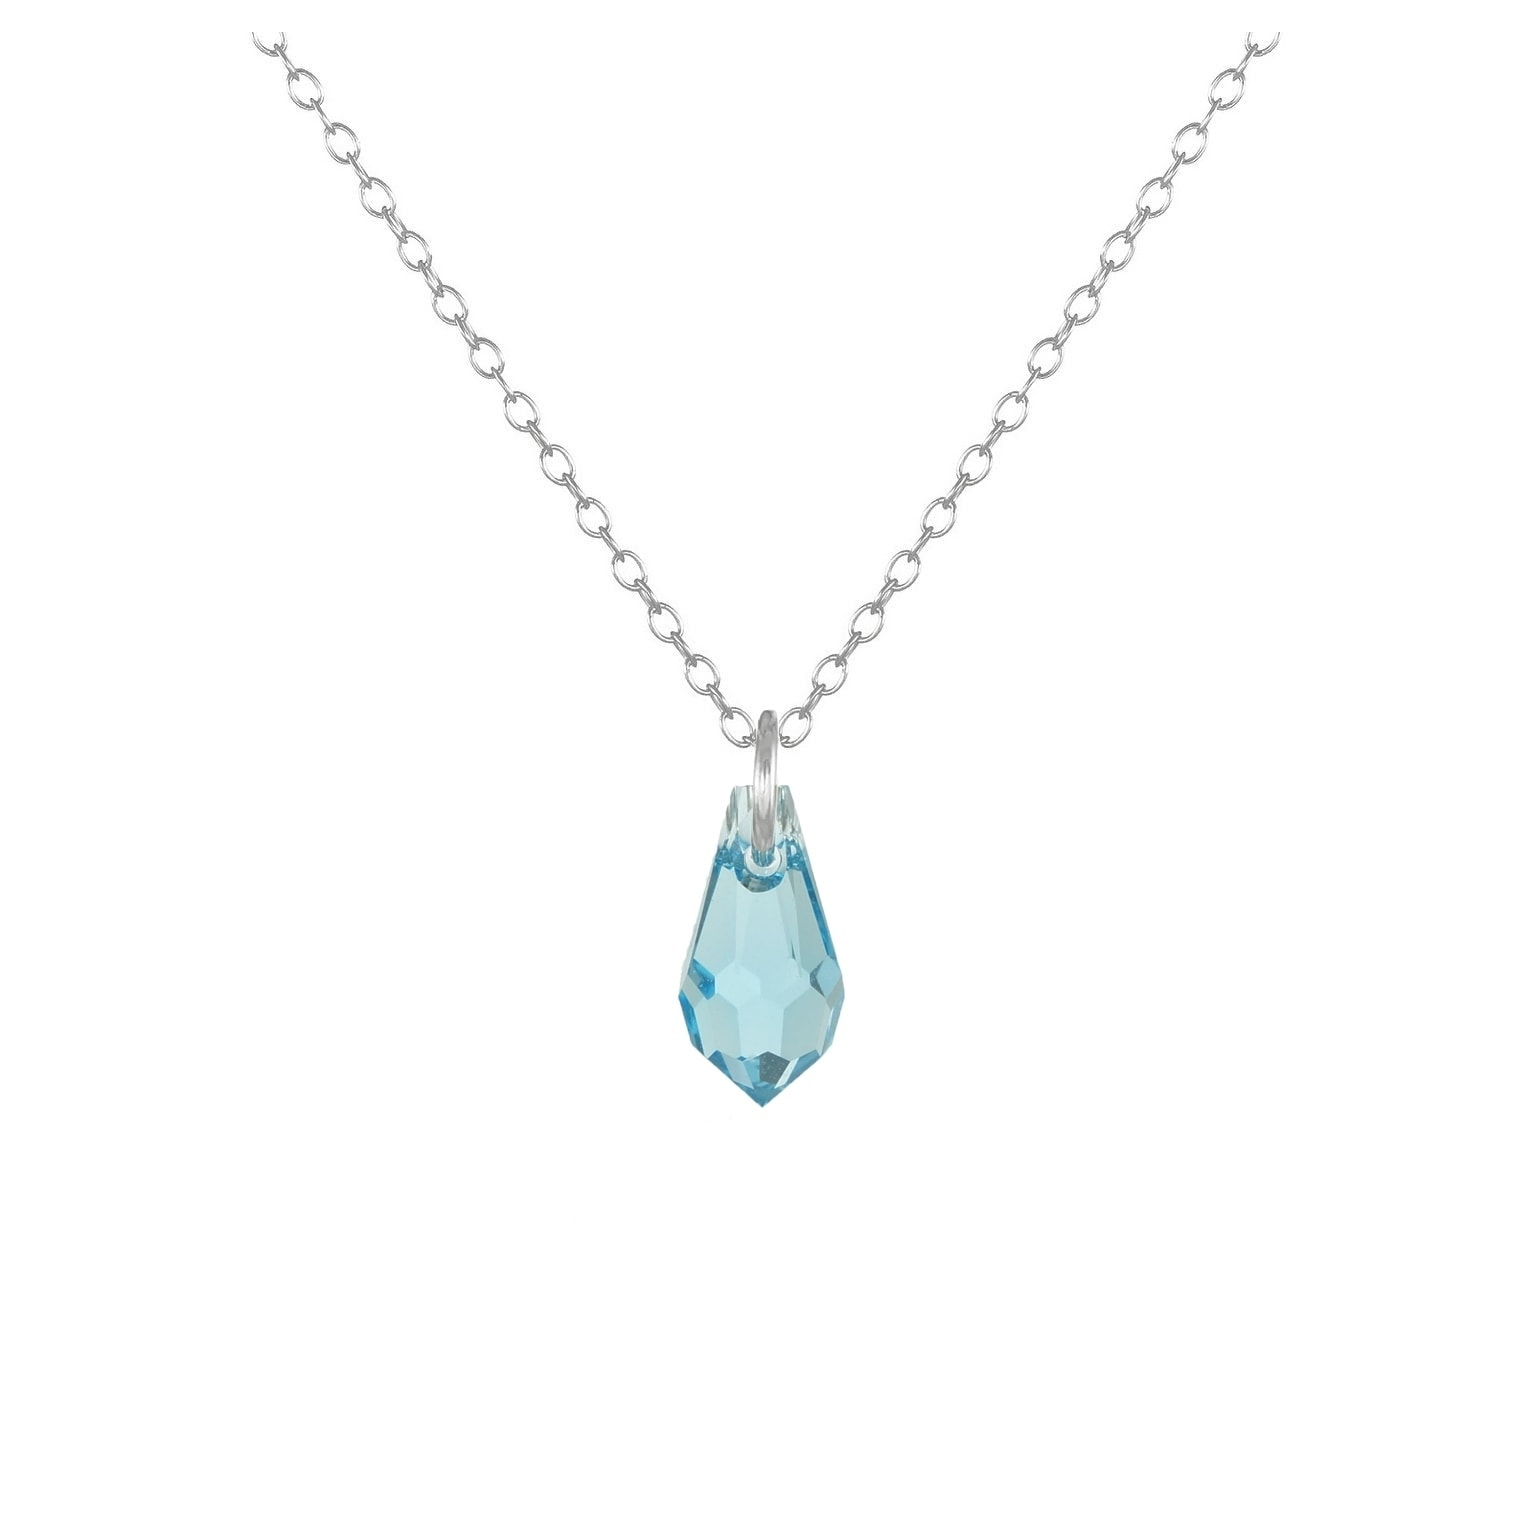 Small Beautiful Quartz Crystal Sterling Silver Pendant